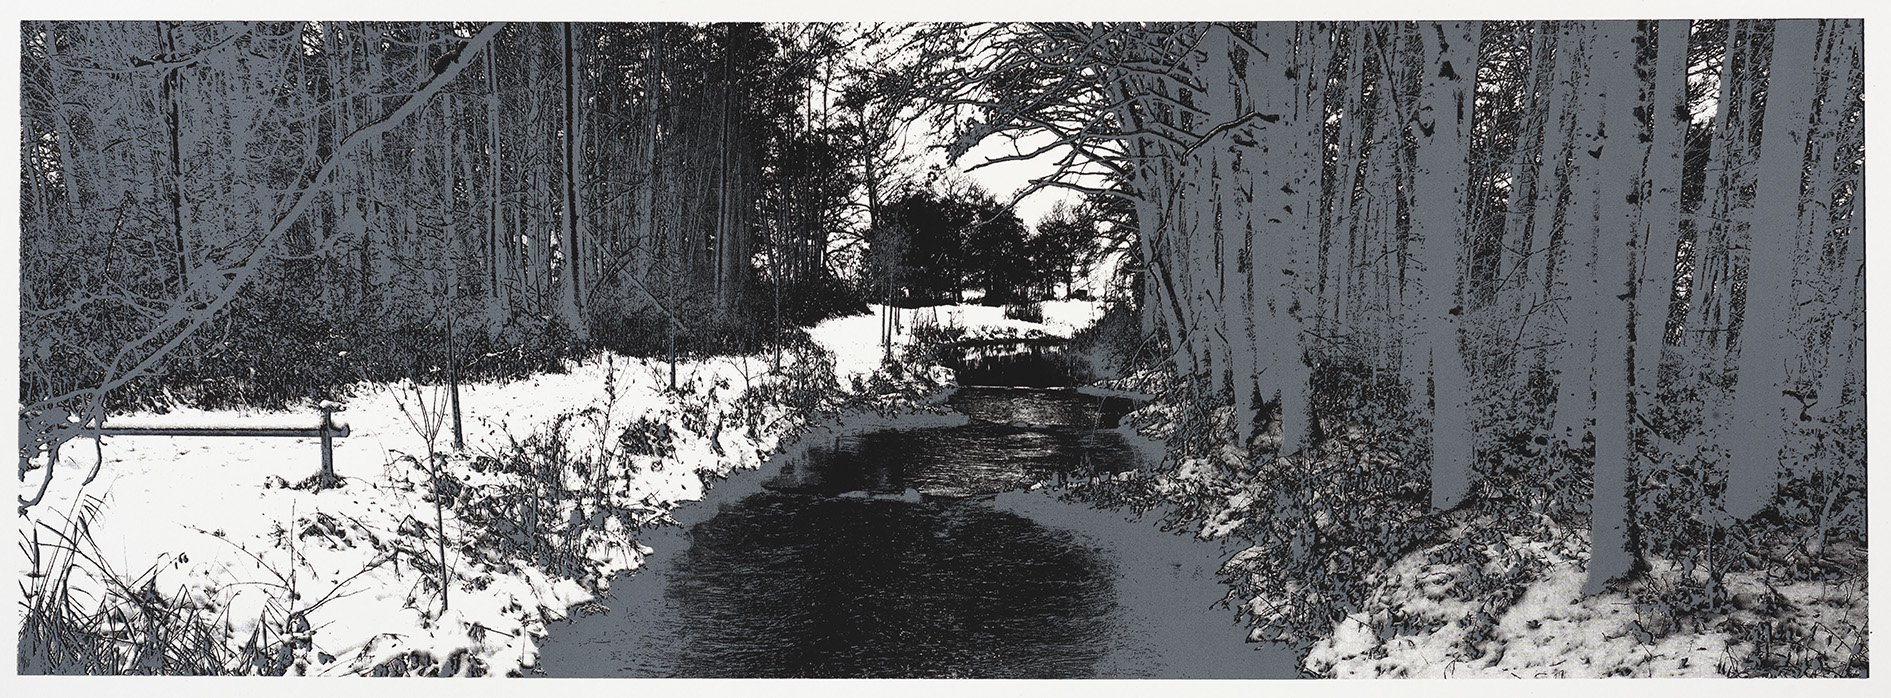 """Change of Seasons I (winter)"" 35 x 100 cm. silkscreenprint (2015)"